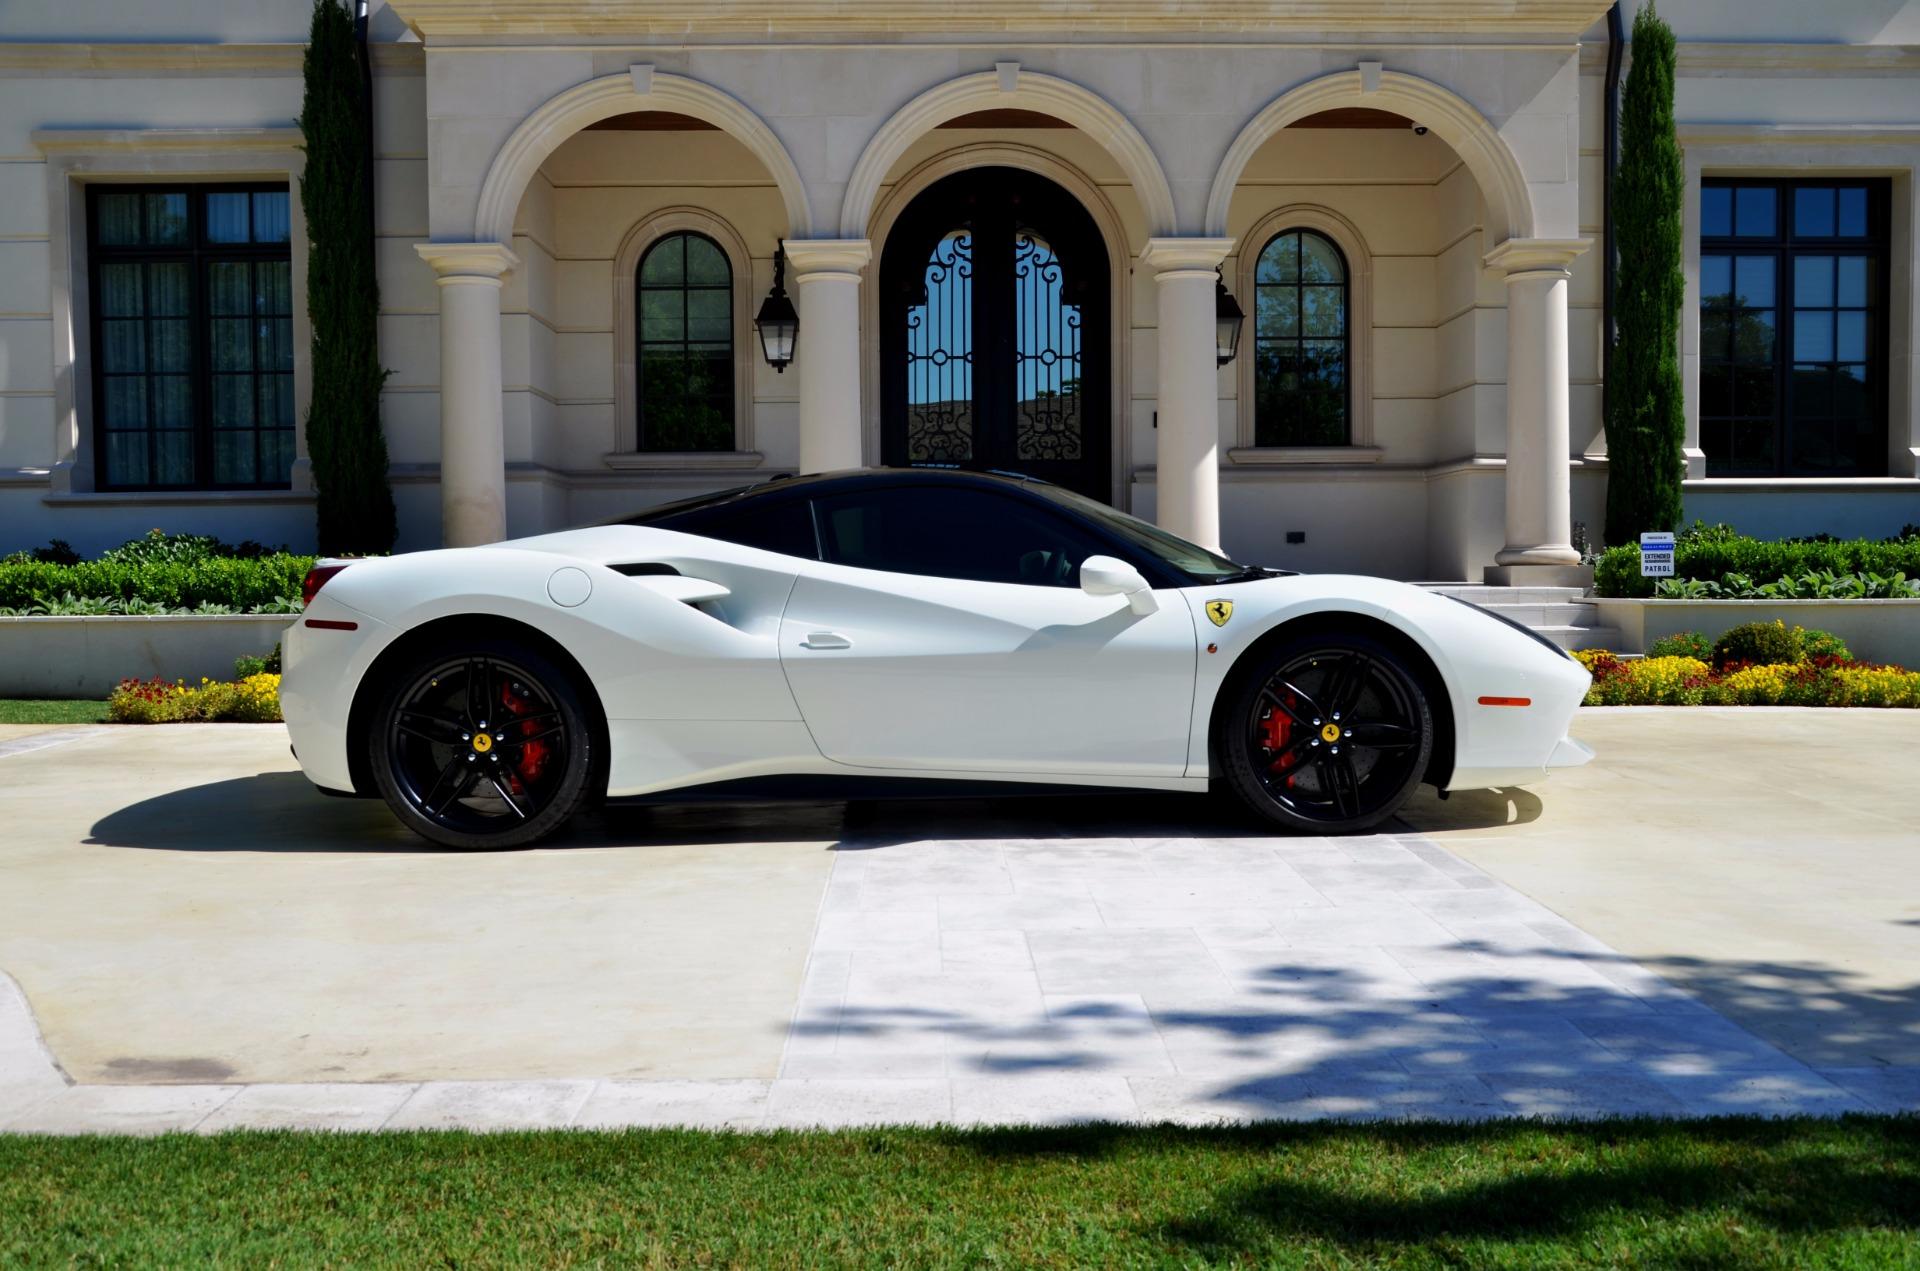 Used 2017 Ferrari 488 GTB for sale Sold at Platinum Motorcars in Dallas TX 75247 1